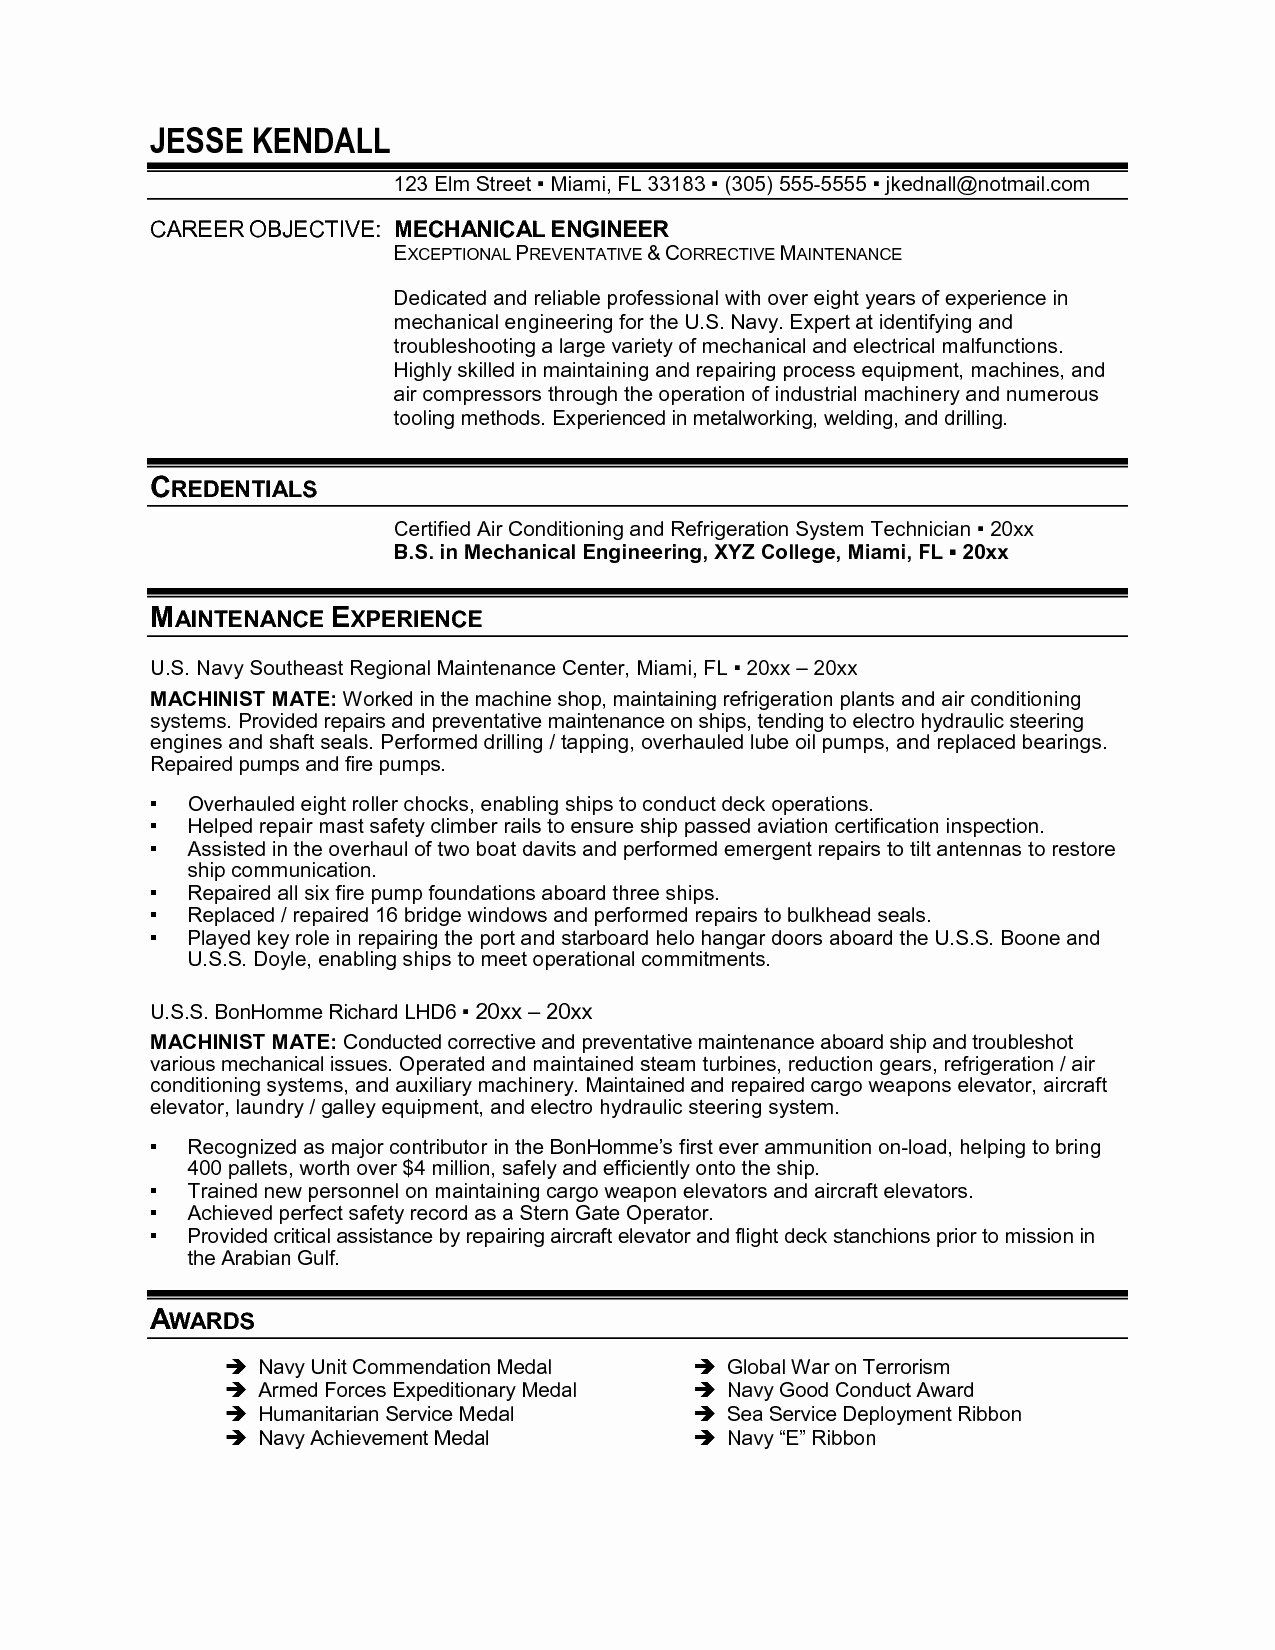 20 Critical Care Nursing Resume Colimatrespuntocero Com In 2021 Engineering Resume Mechanical Engineer Resume Engineering Resume Templates